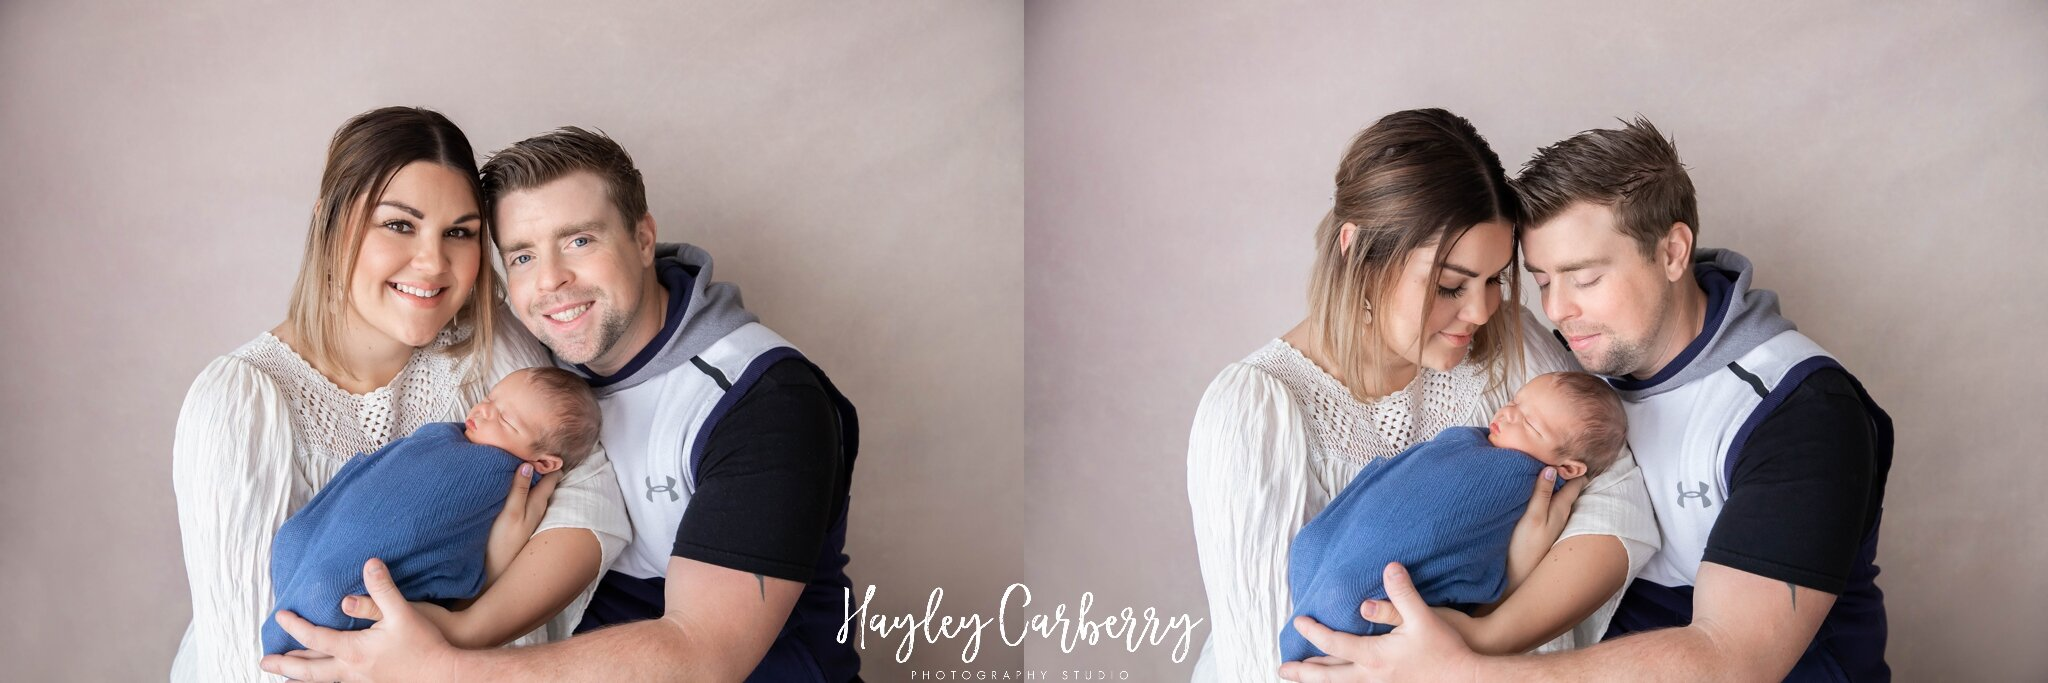 Canberra Family Baby Portrait Children Photographer (10 of 19)_WEB.jpg